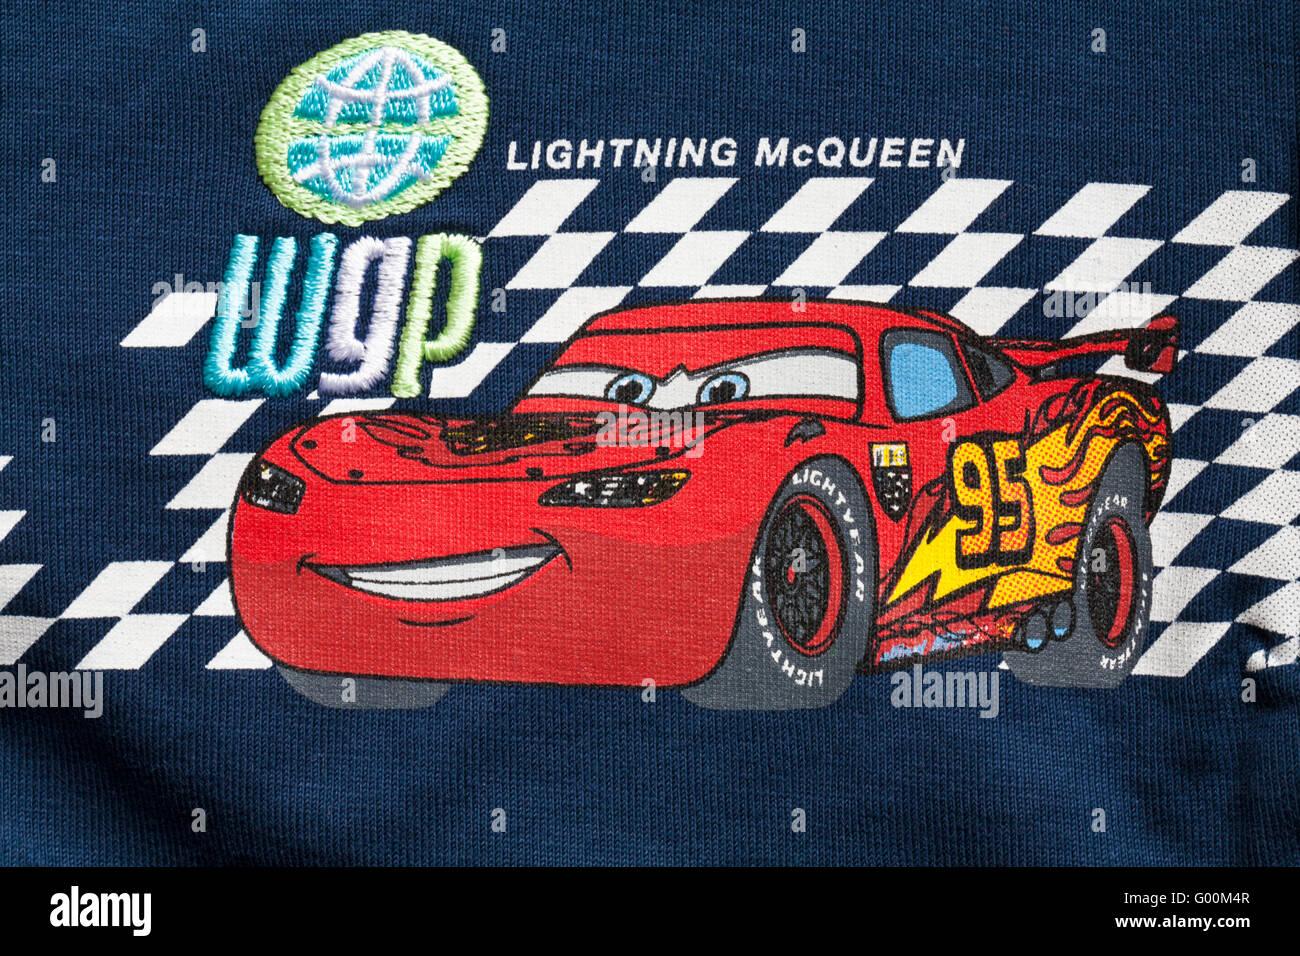 Boys Top With Lightning McQueen Disney Car